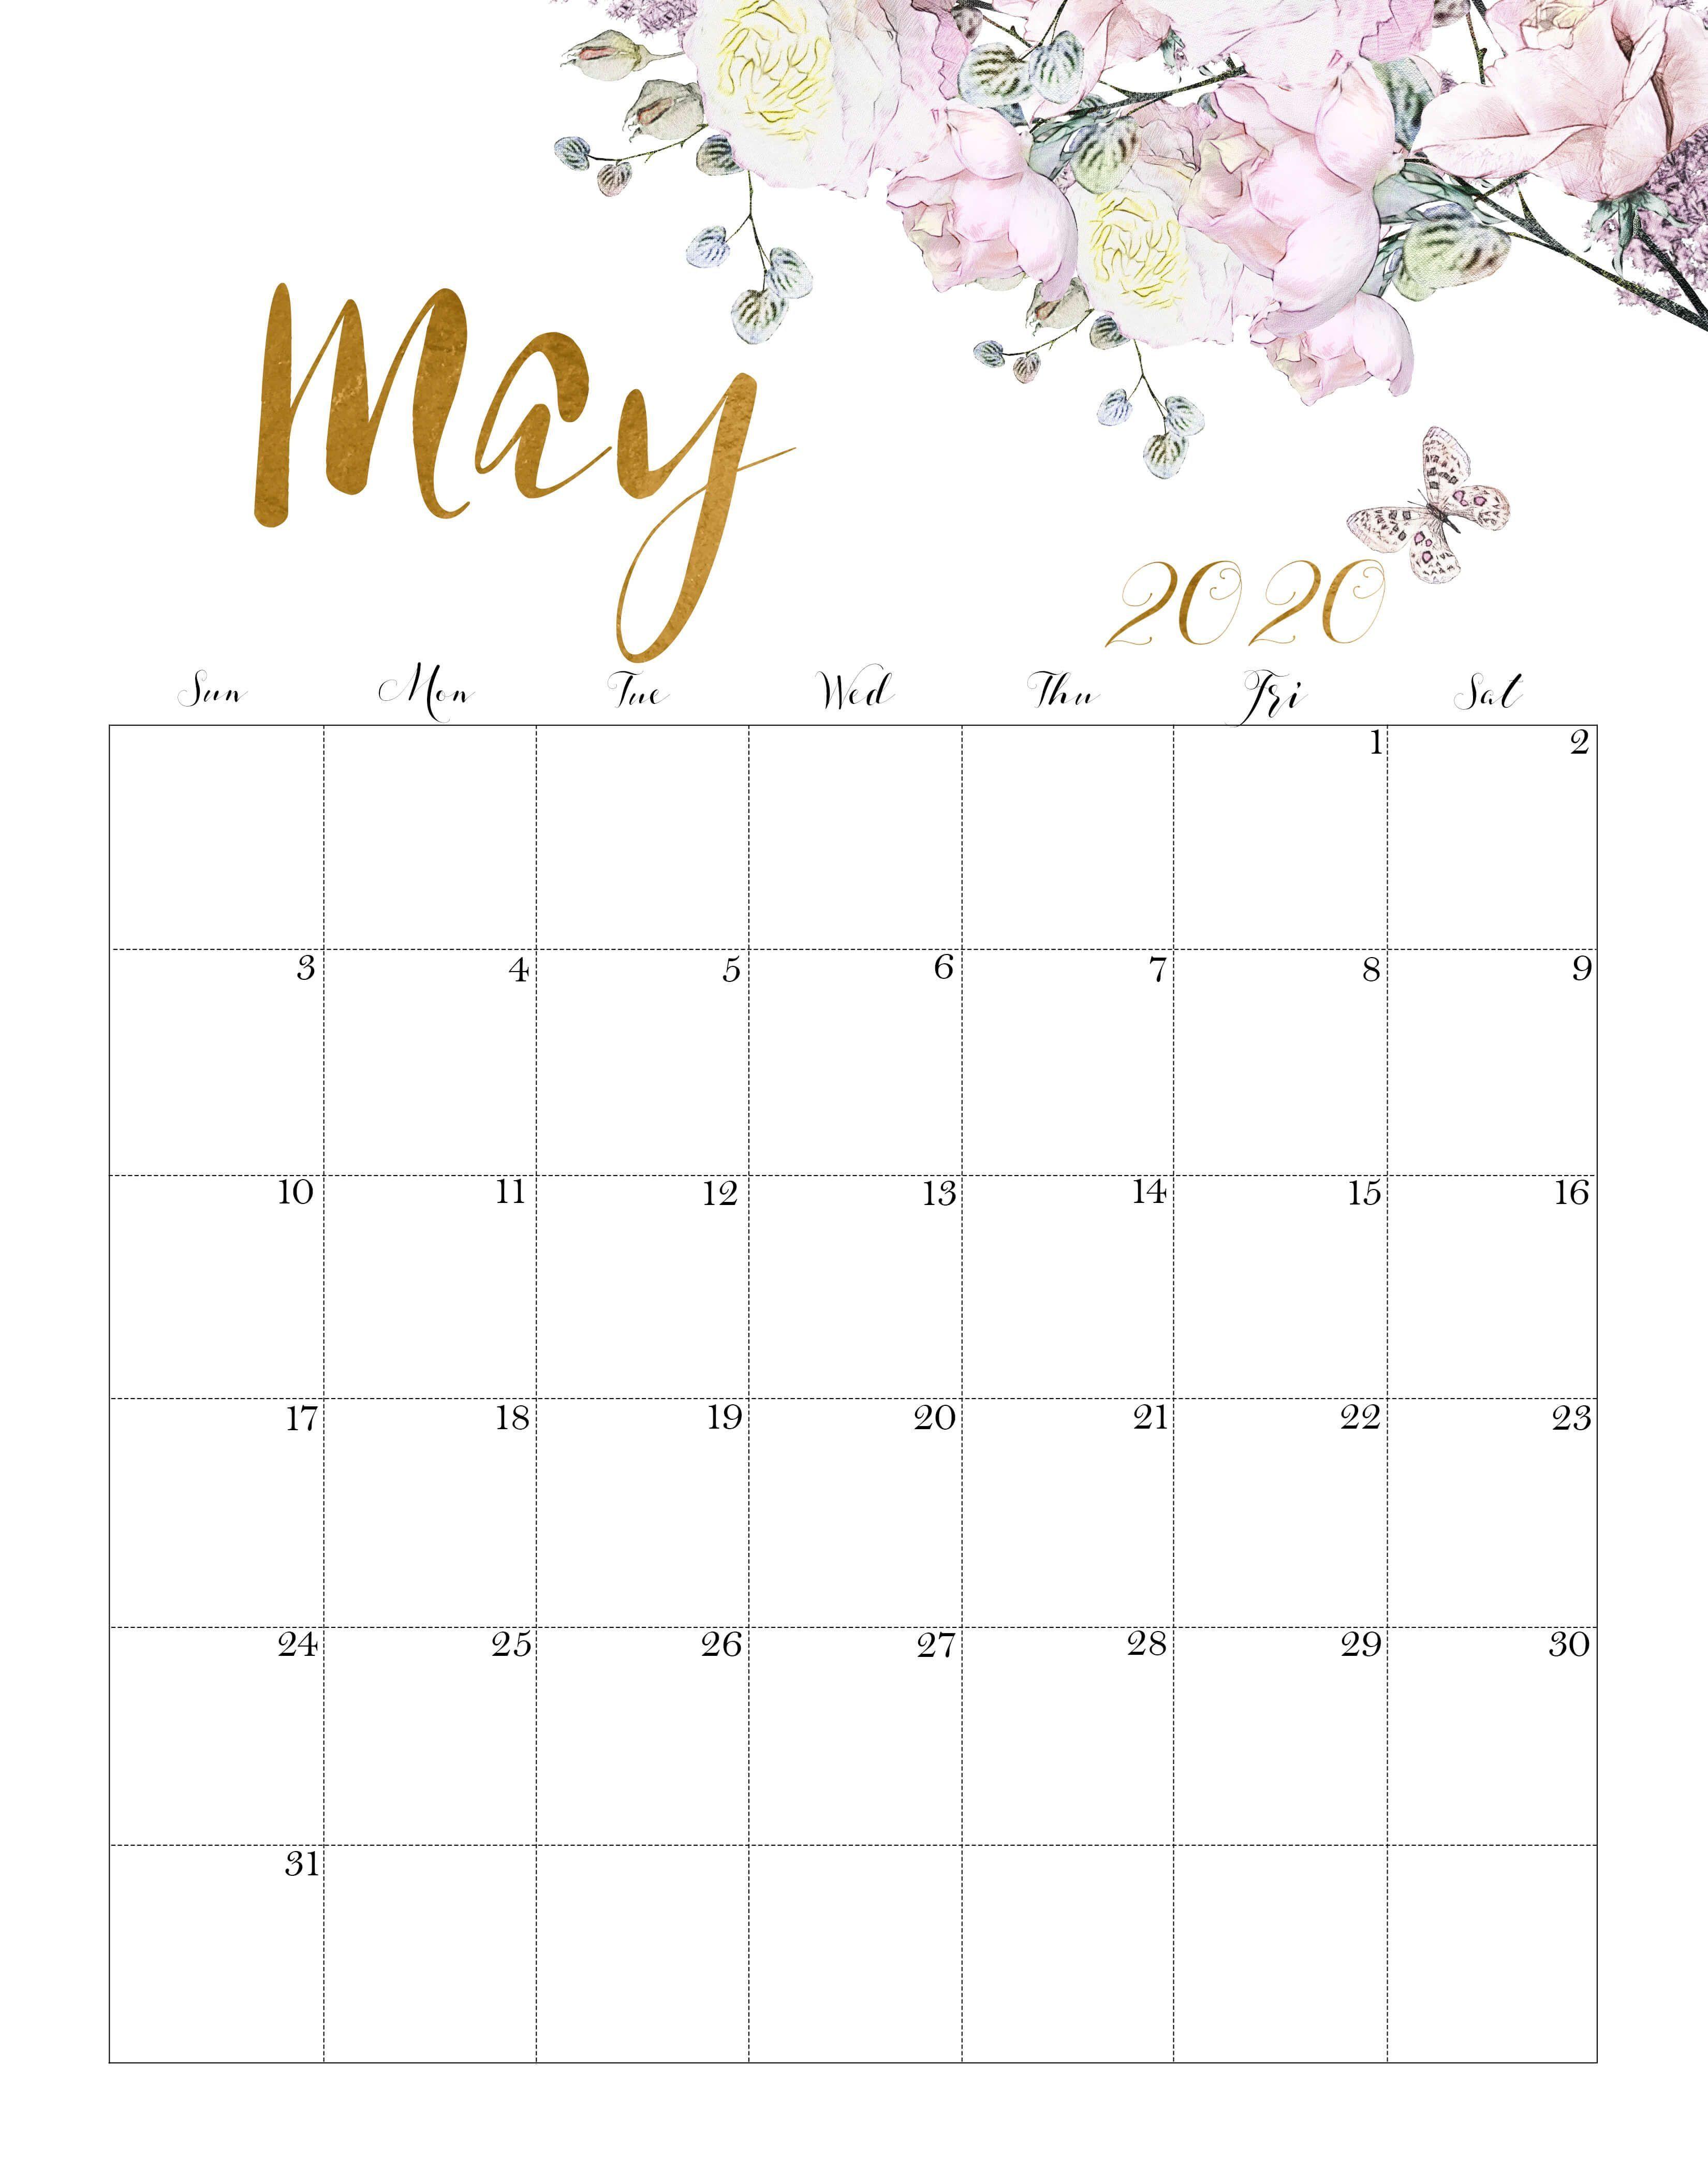 Floral May 2020 Calendar Cute | Calendar wallpaper, Print calendar